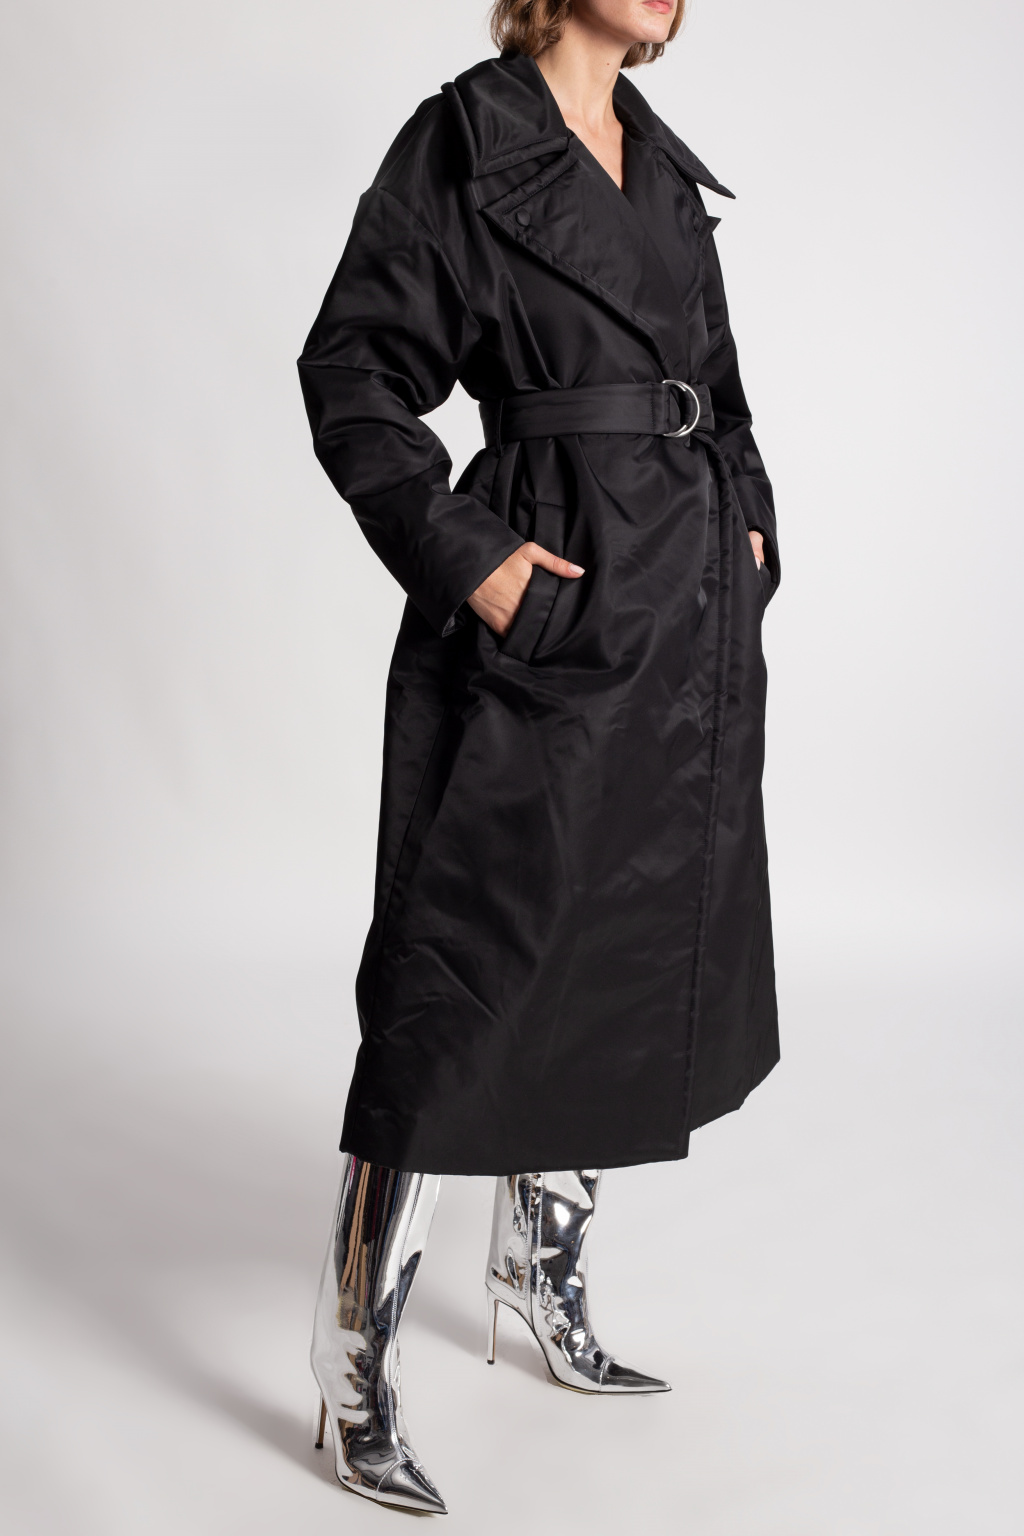 Alexandre Vauthier 'Raquel' stiletto knee-high boots